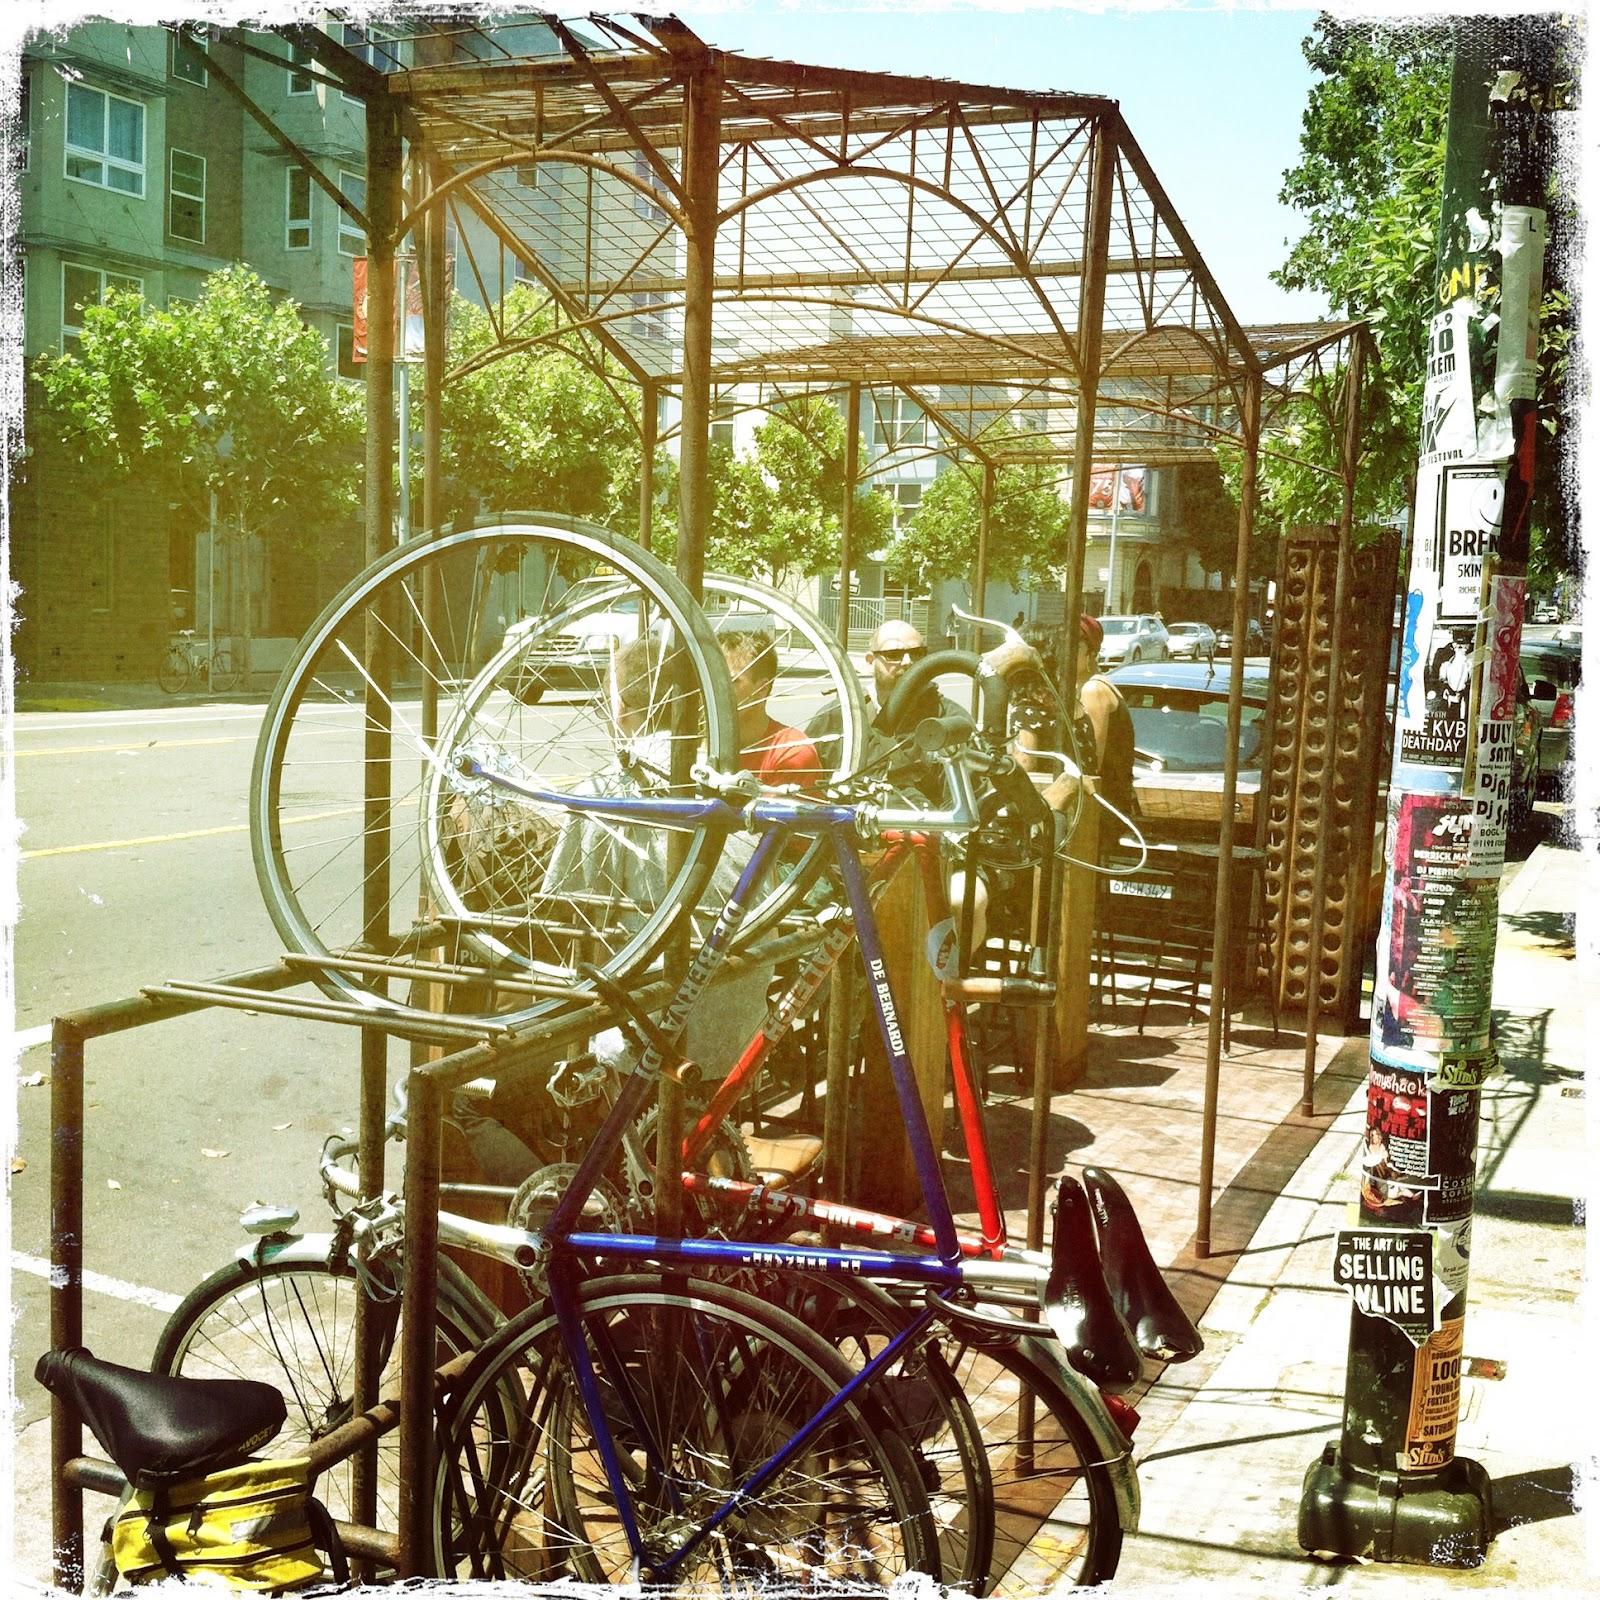 Oakland Streets: Bike Rack Art